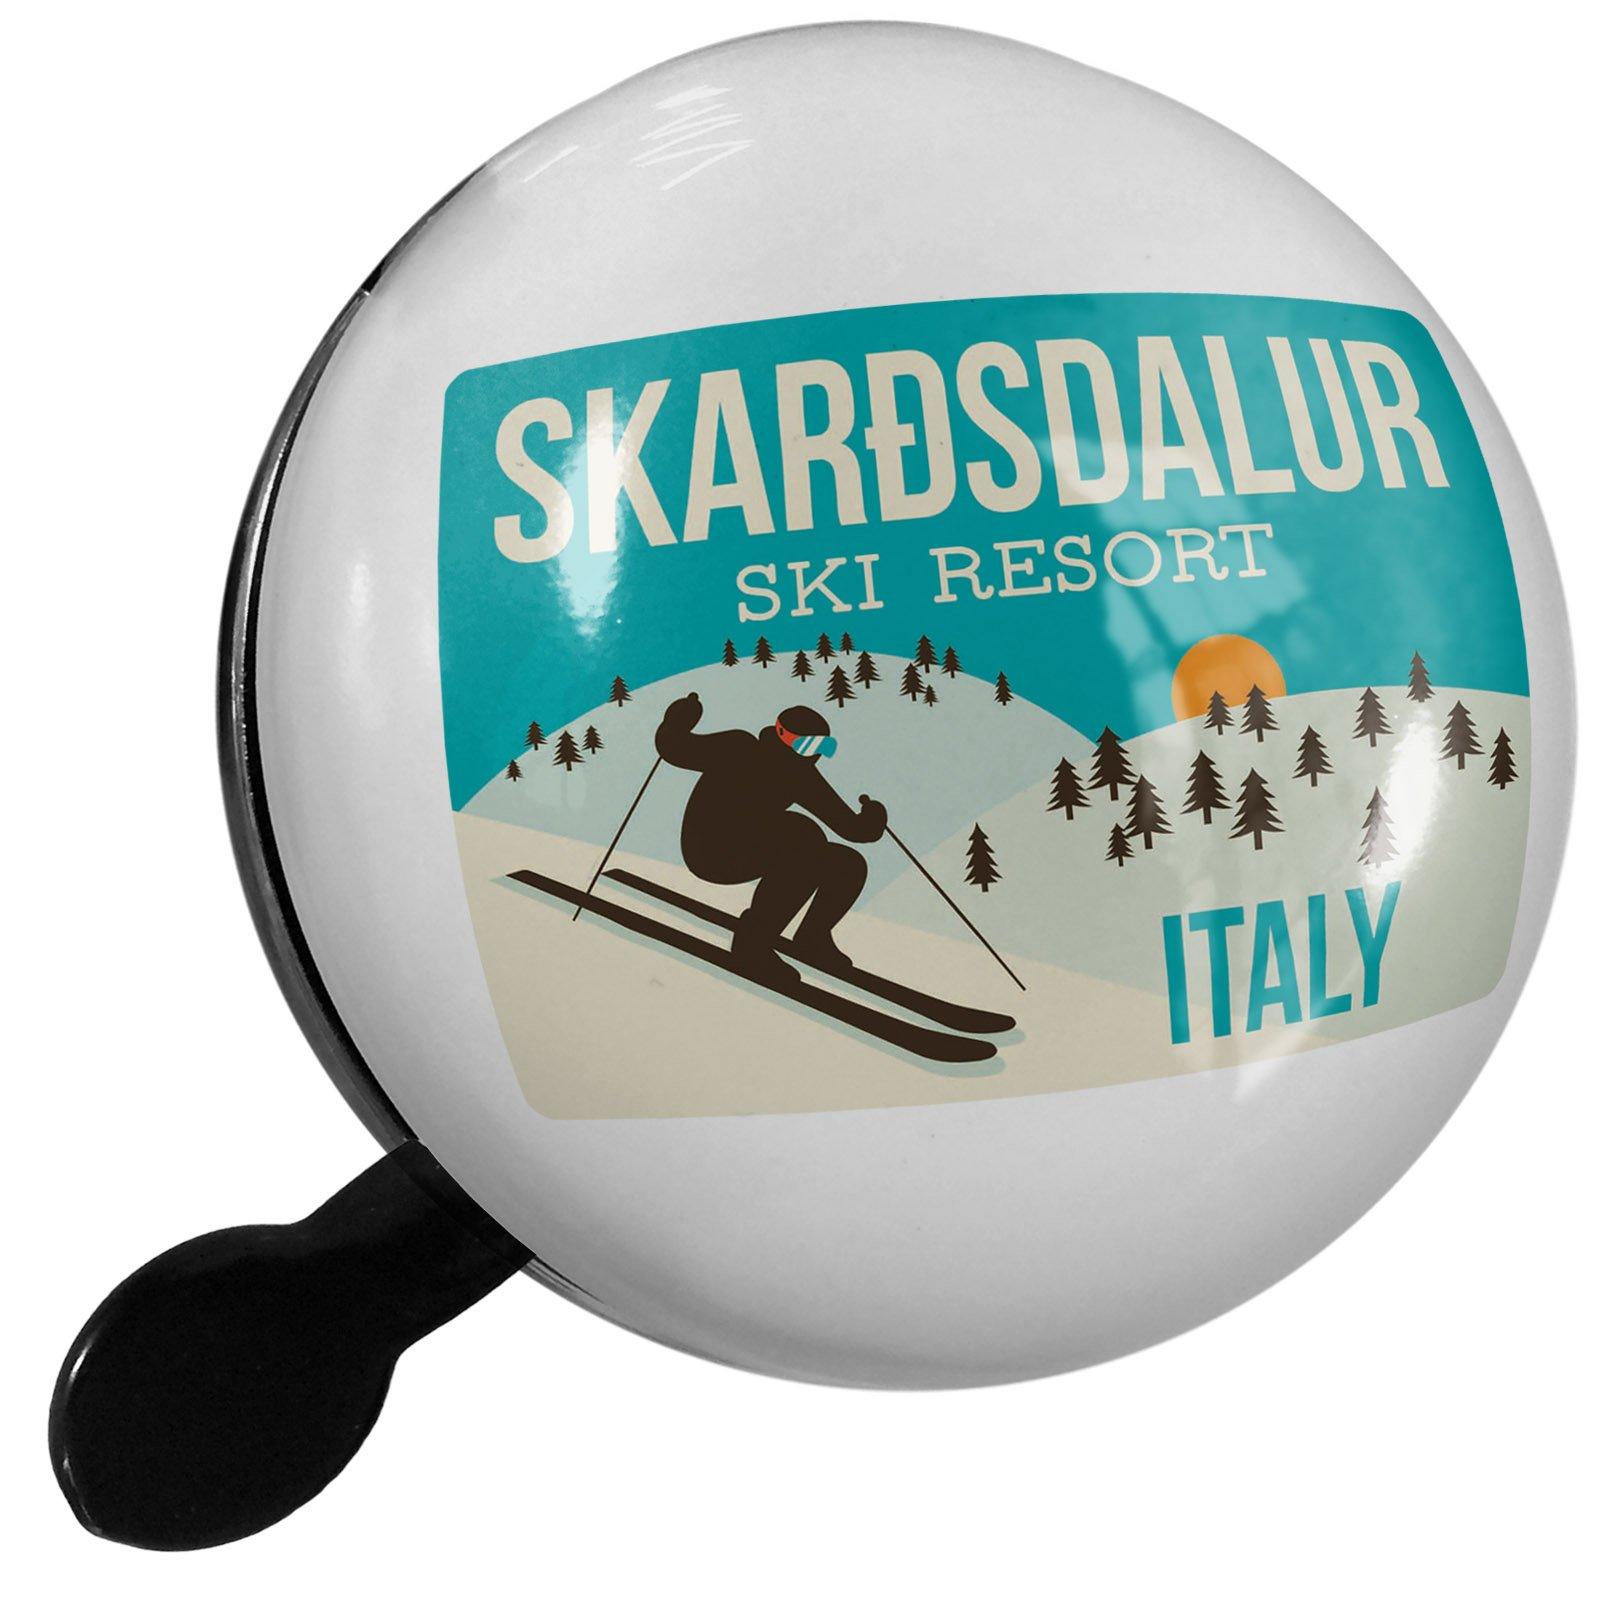 Small Bike Bell Skarðsdalur Ski Resort - Italy Ski Resort - NEONBLOND